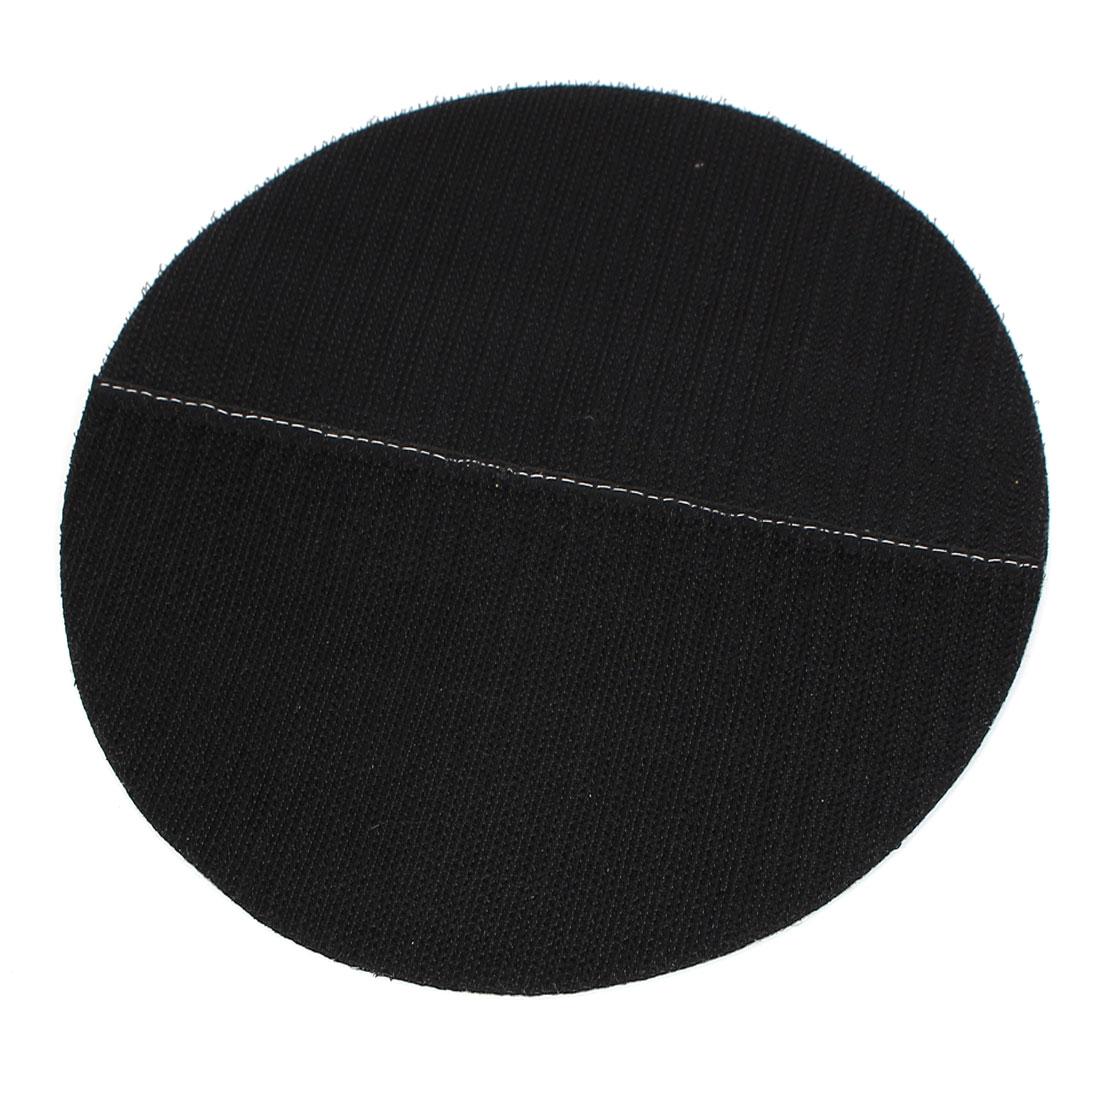 "7"" 180mm Diameter Round Hook and Loop Polishing Pad Mat Rotary Tool Black"